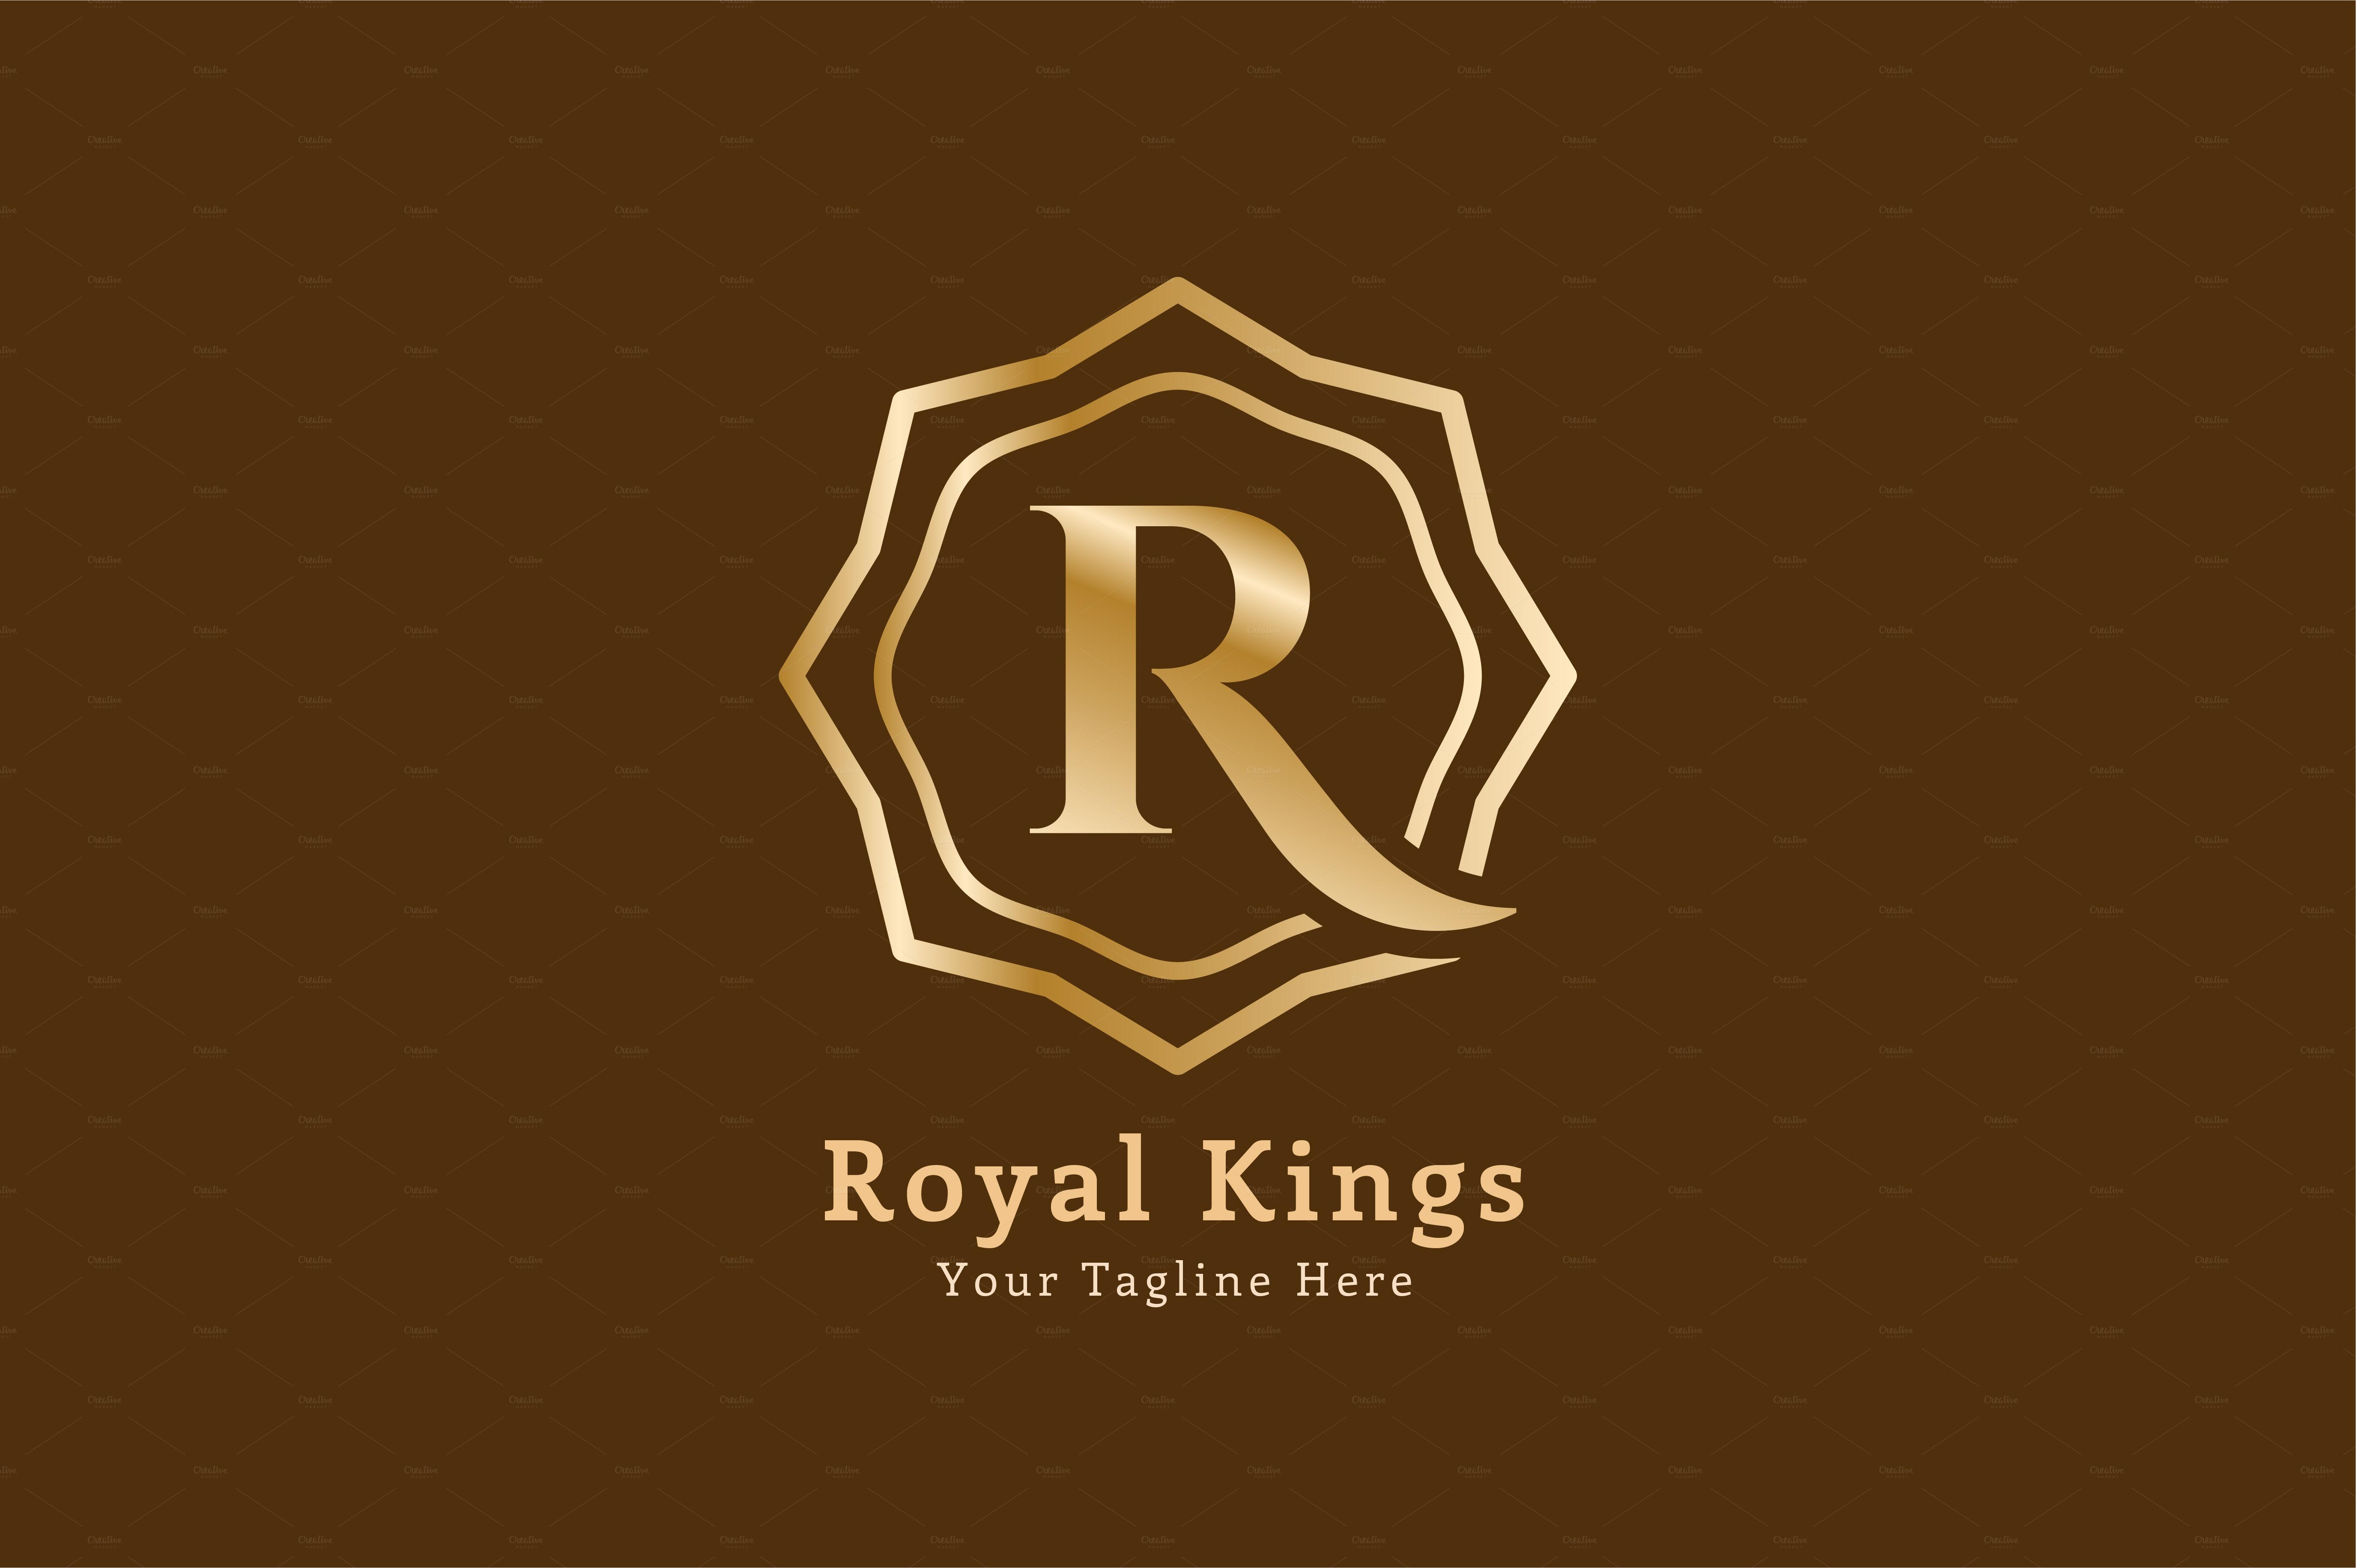 royal arabic r logo letter template logo templates on creative market. Black Bedroom Furniture Sets. Home Design Ideas